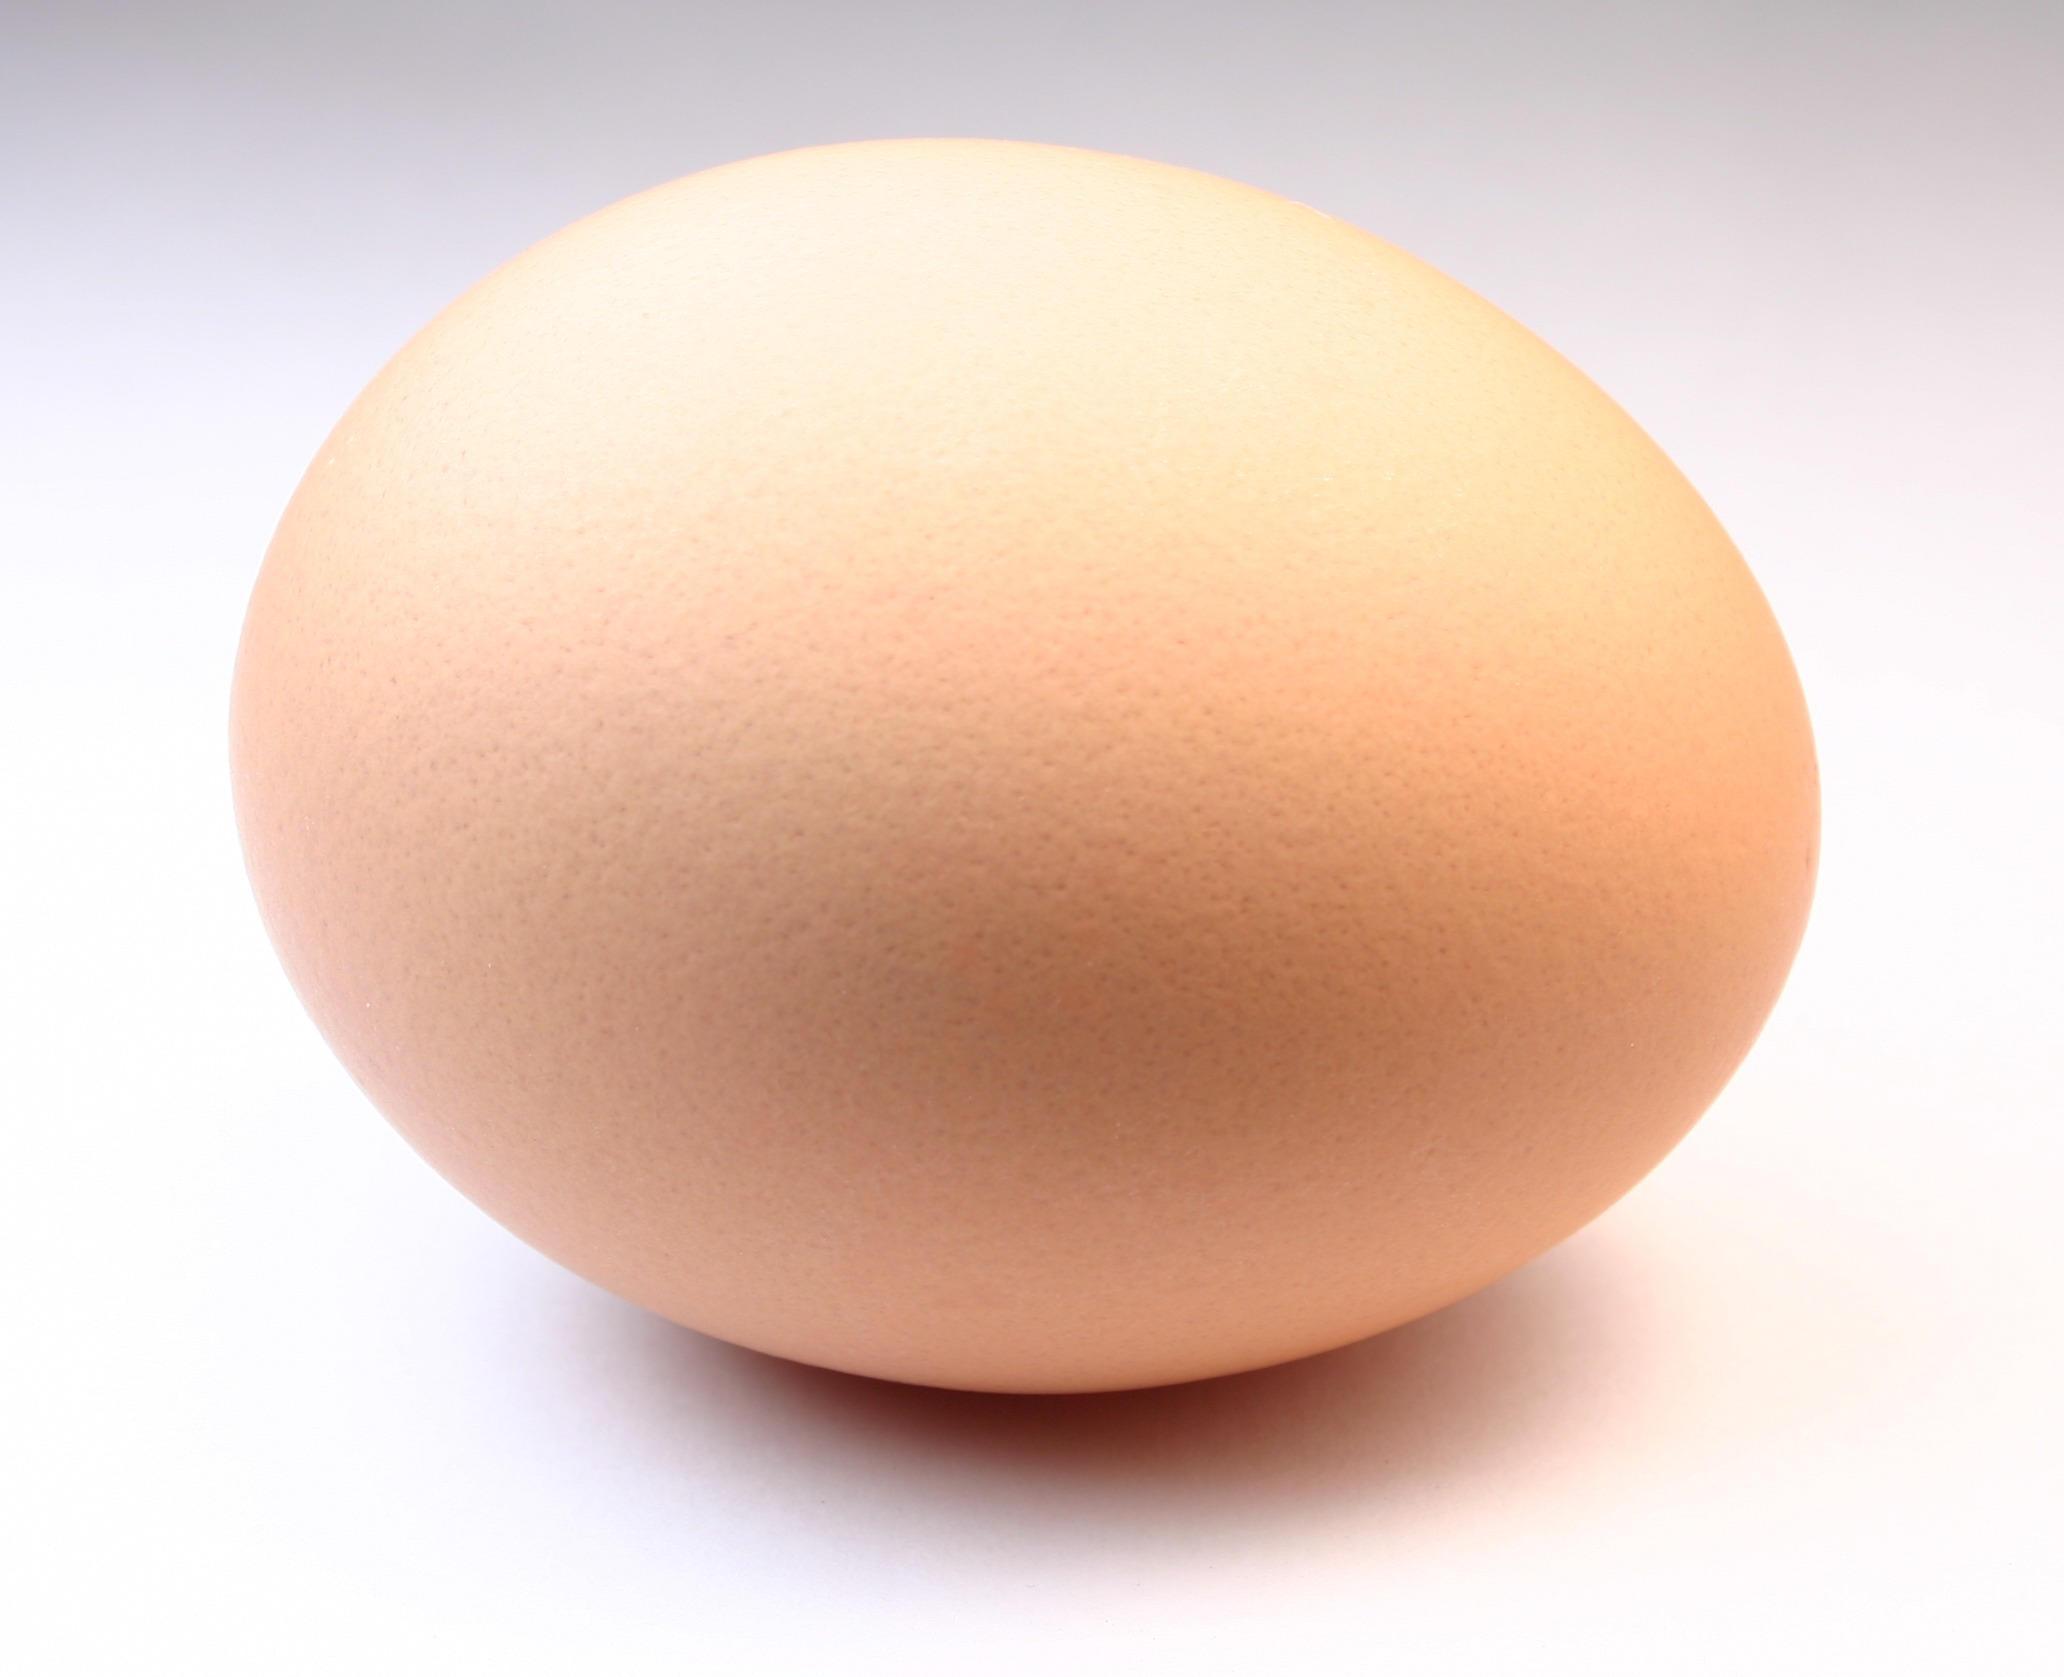 Perfect Egg By Fytastock On Deviantart